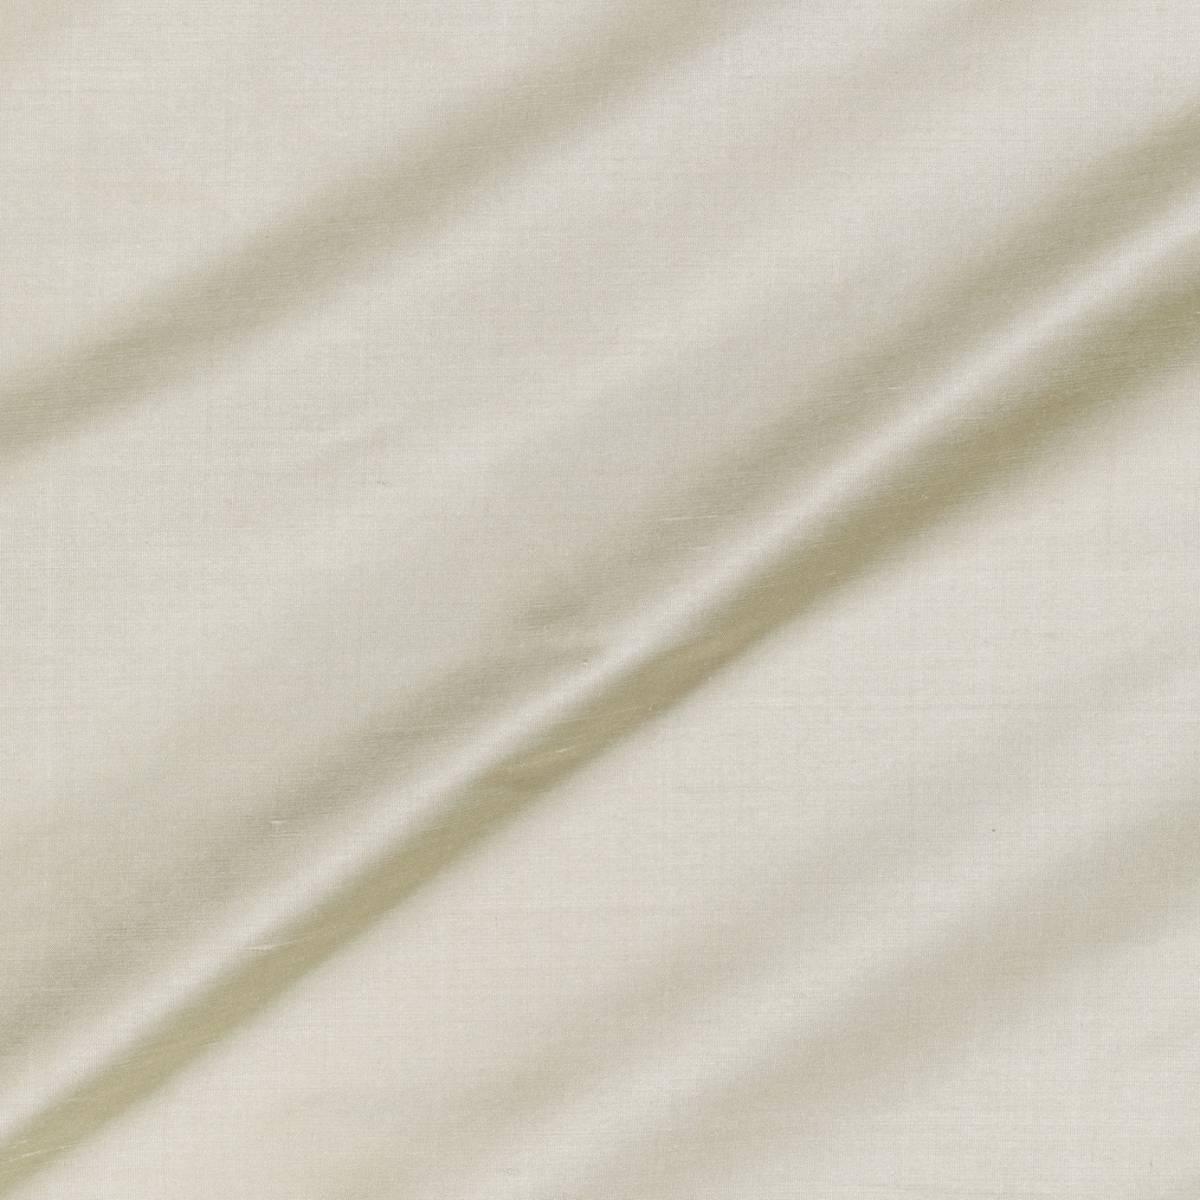 Regal Silk Fabric  Wasabi (38000122)  James Hare Regal Silk Vol 3 Fabrics  # Wasbak Fabriek_155207